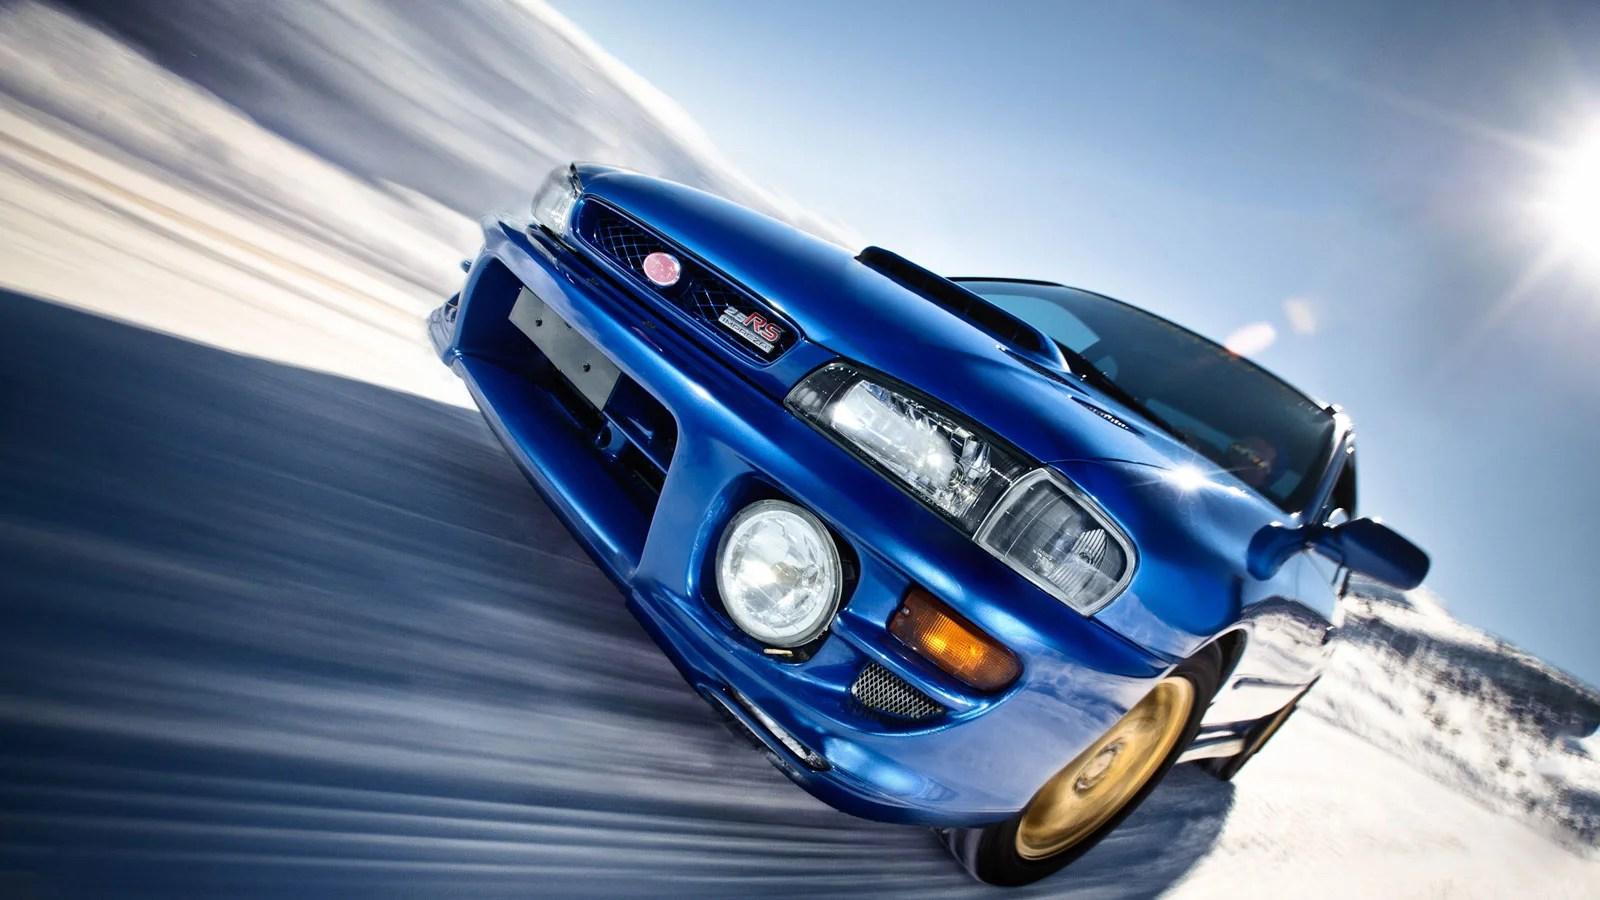 Subaru Impreza Wallpaper Hd Your Ridiculously Awesome Subaru Wallpaper Is Here